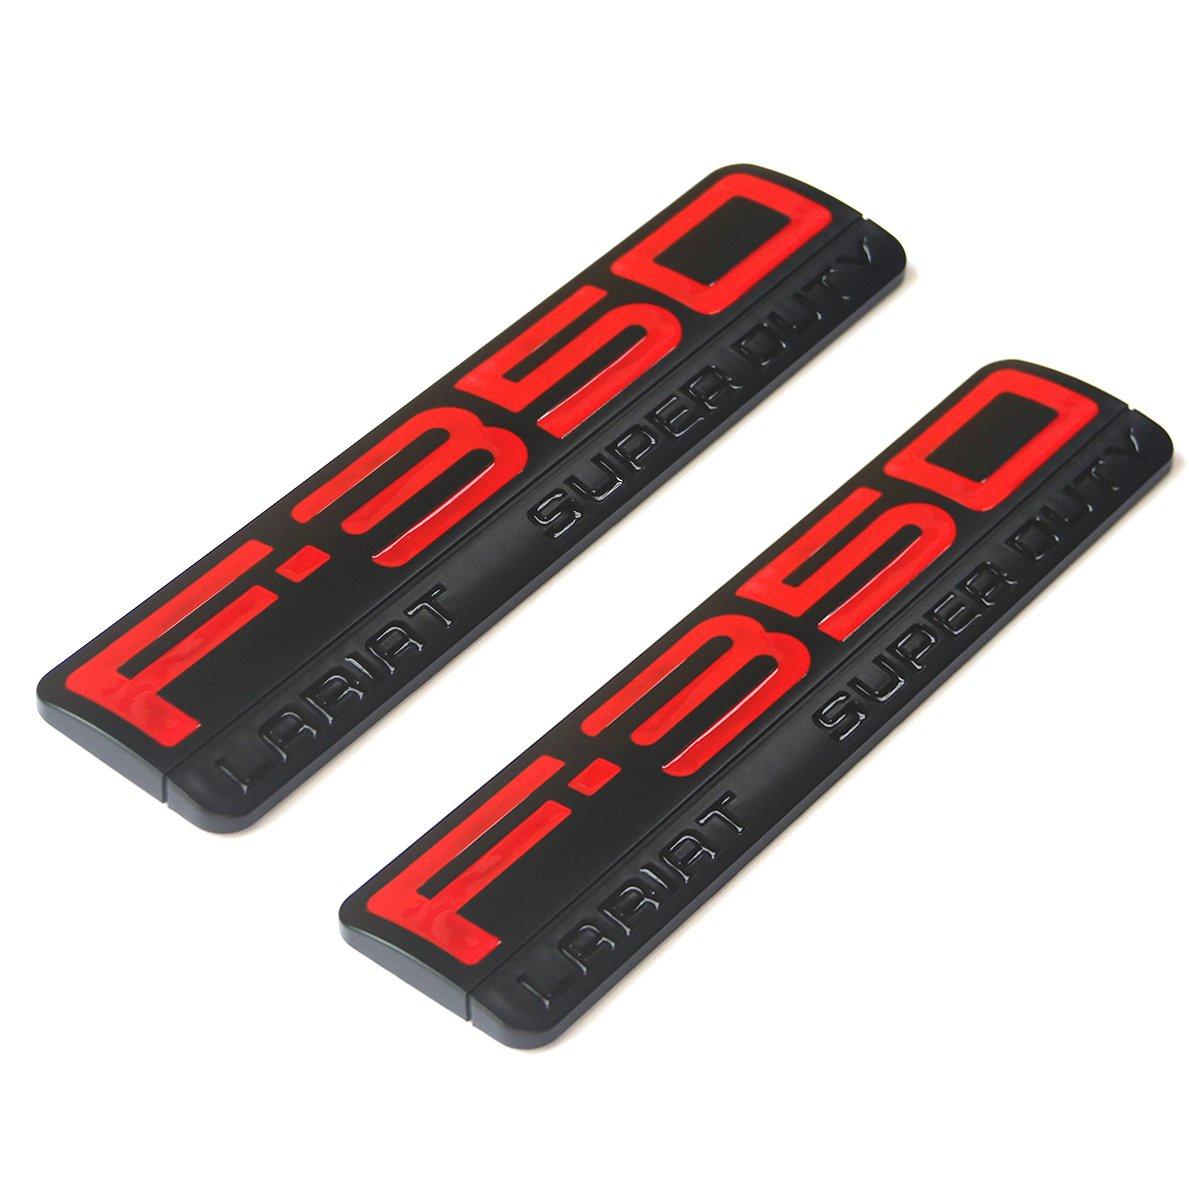 2x OEM F-350 Lariat Super Duty Side Fender Emblems Badge 3D logo Replacement for F350 Lariat Pickup Black Red Sanucaraofo